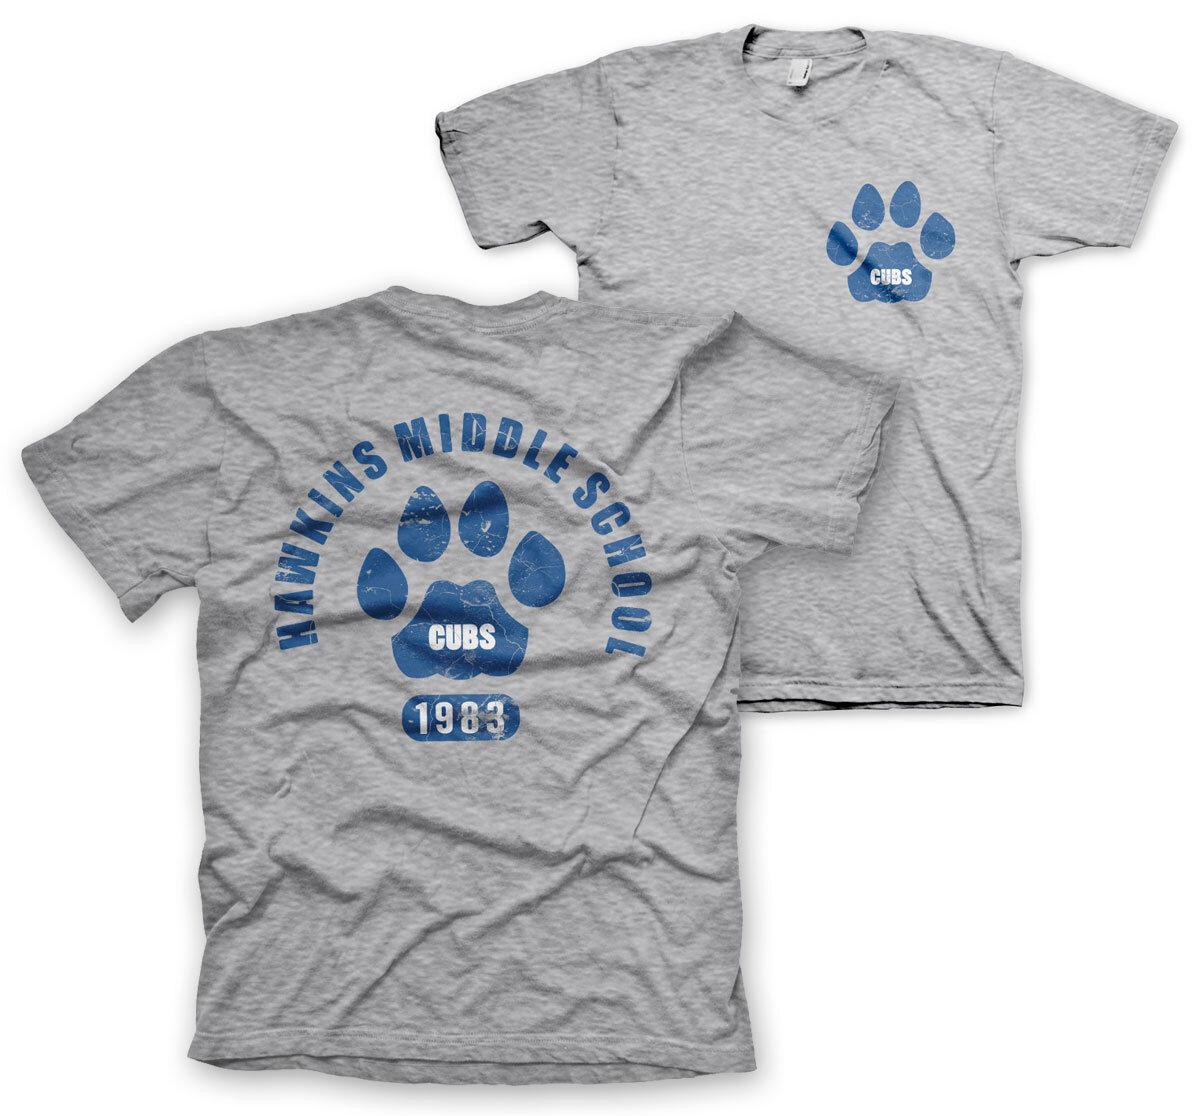 Hawkins Middle School CUBS T-Shirt